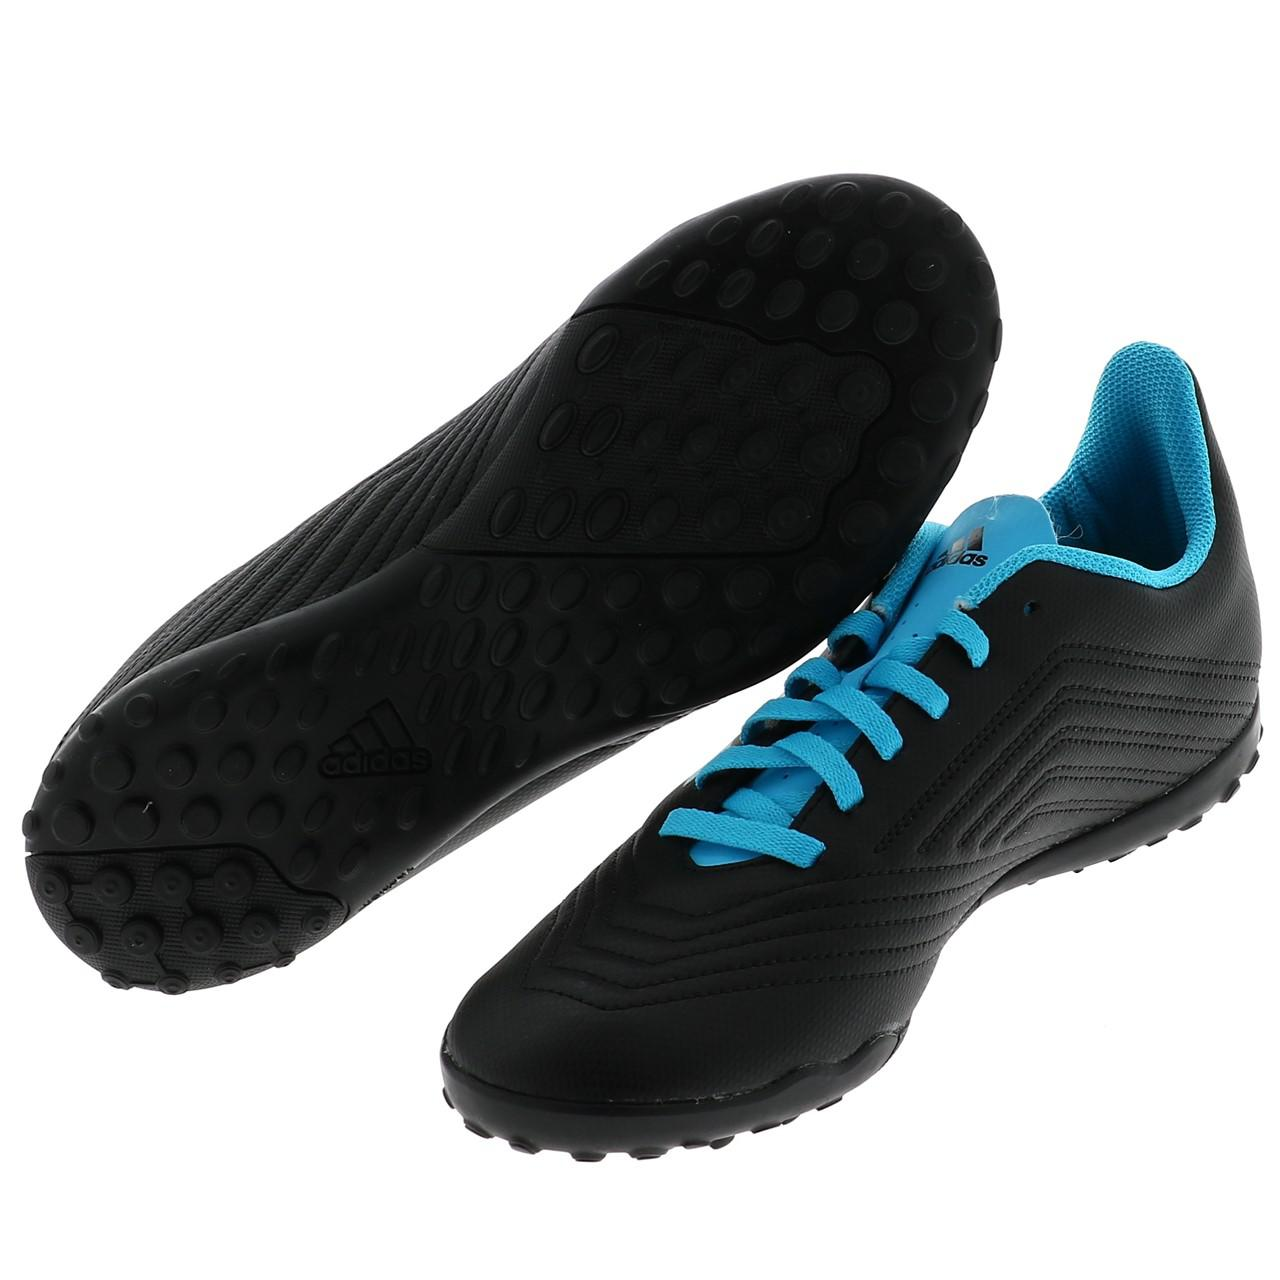 Football-Shoes-Stabilized-Adidas-Predator-19-4-Tf-Jmoule-Jr-Black-42177-N thumbnail 5